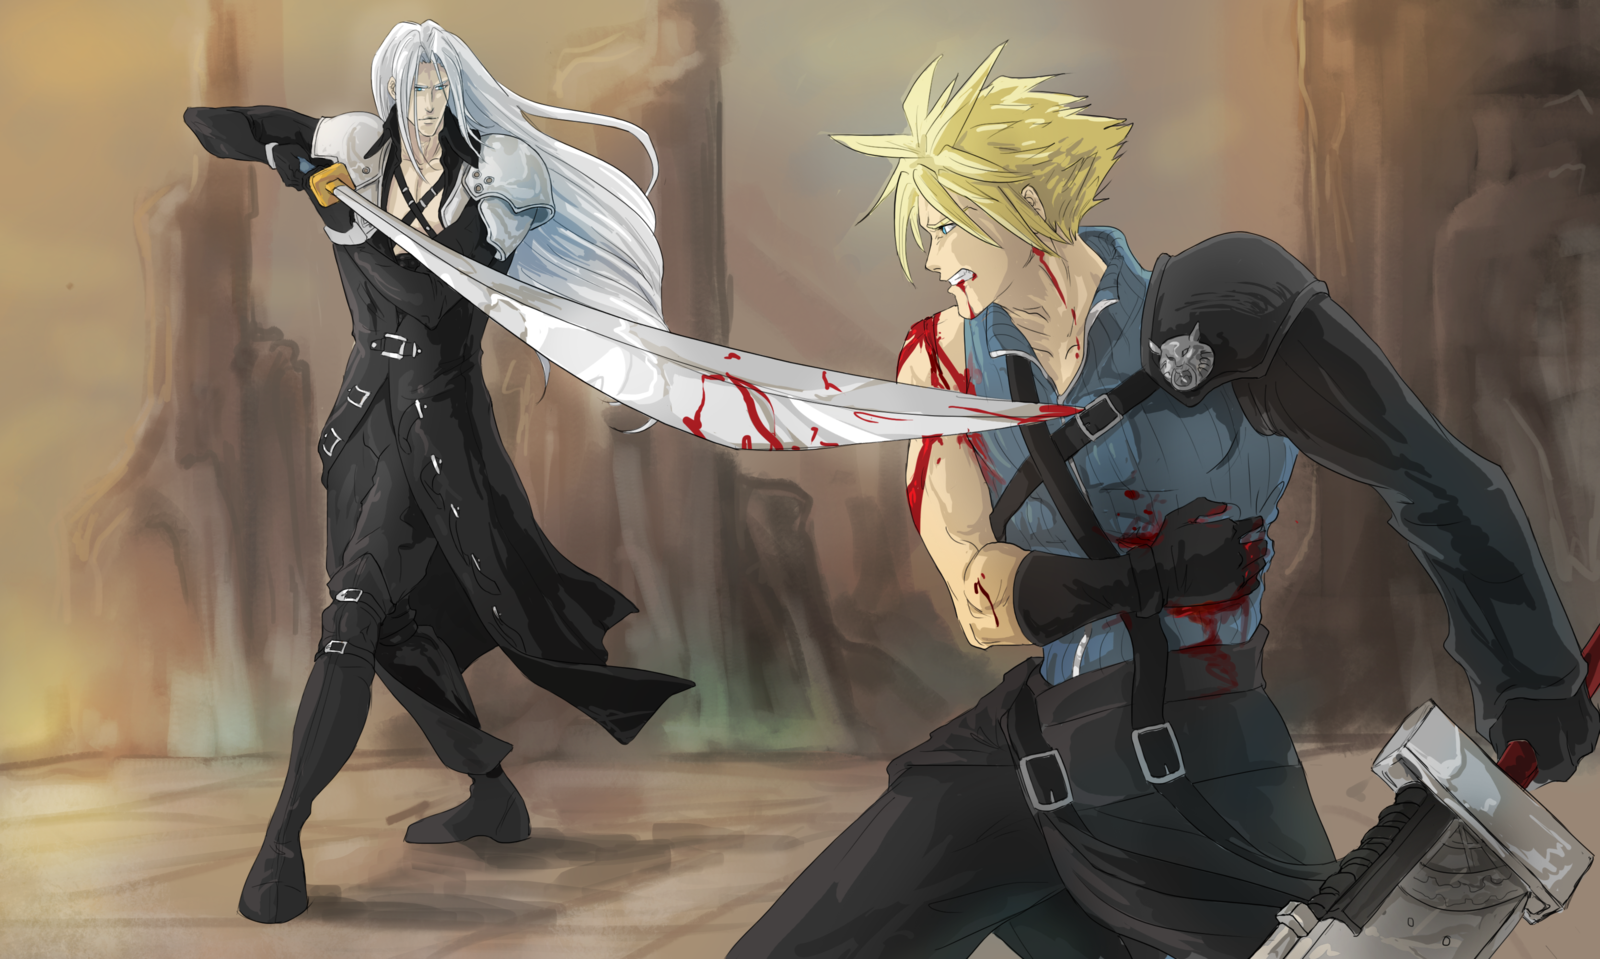 Sephiroth Vs Cloud by ErisLeea 1600x959